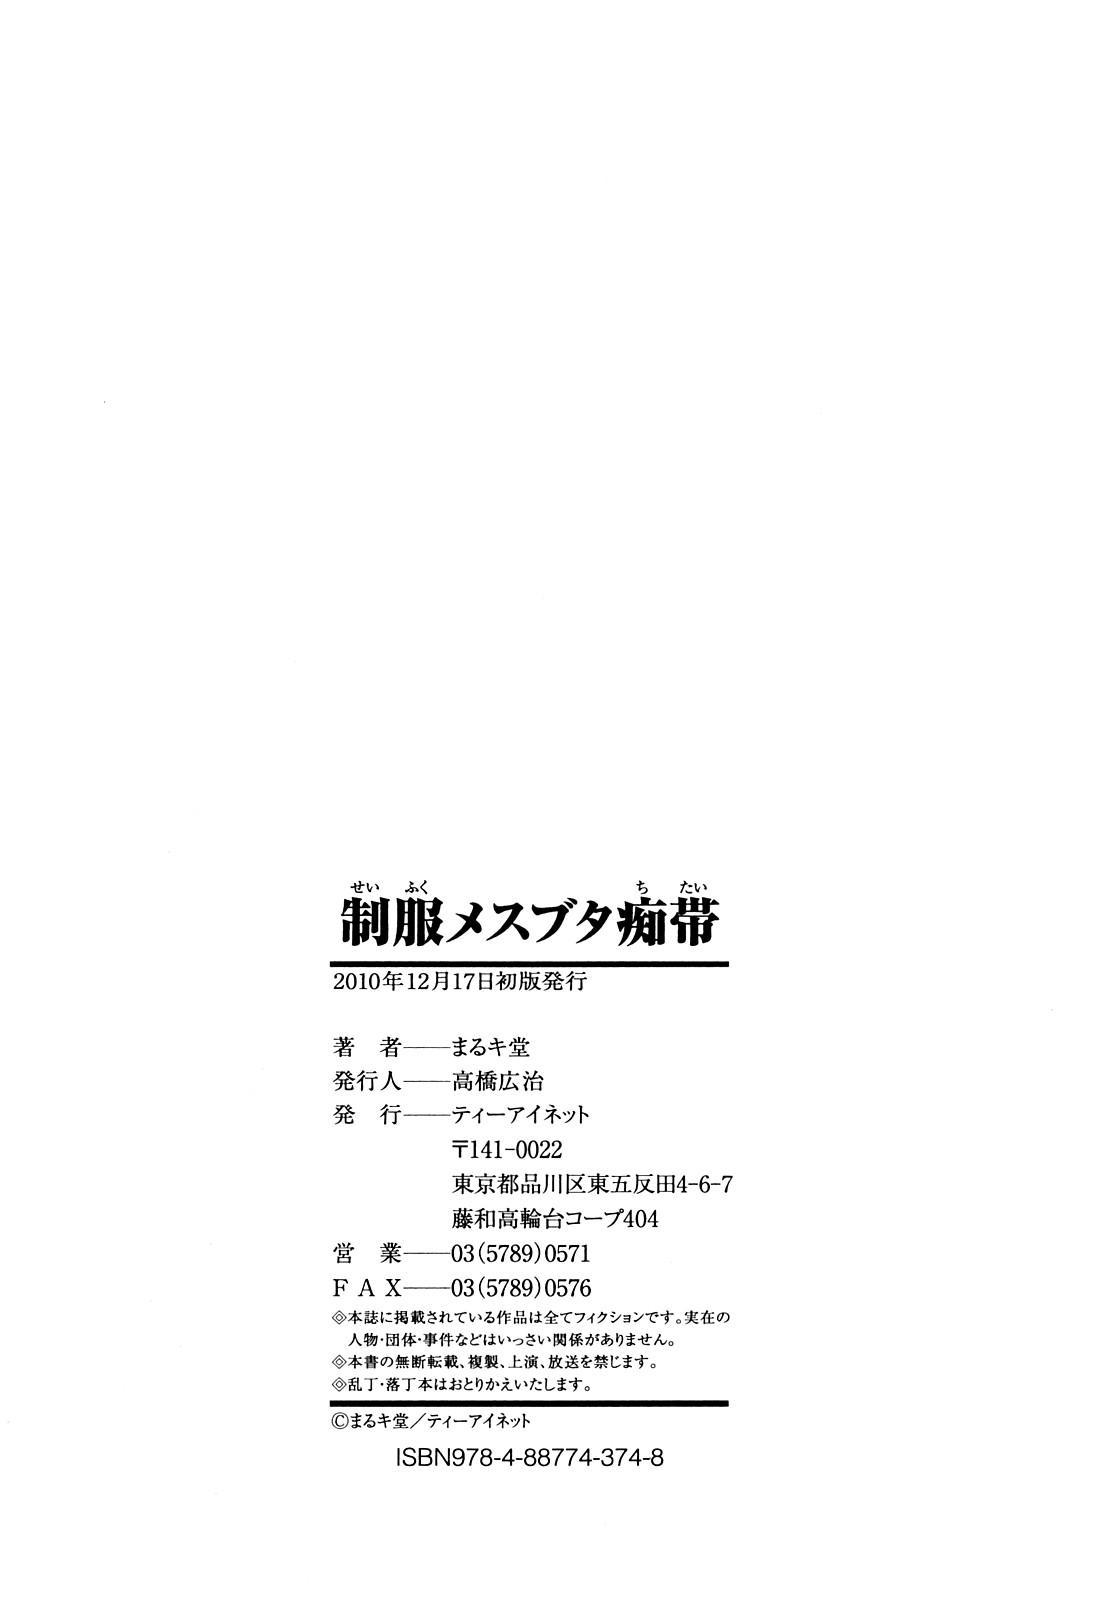 Seifuku Mesubuta Chitai - The Nymphomaniac Zone 242